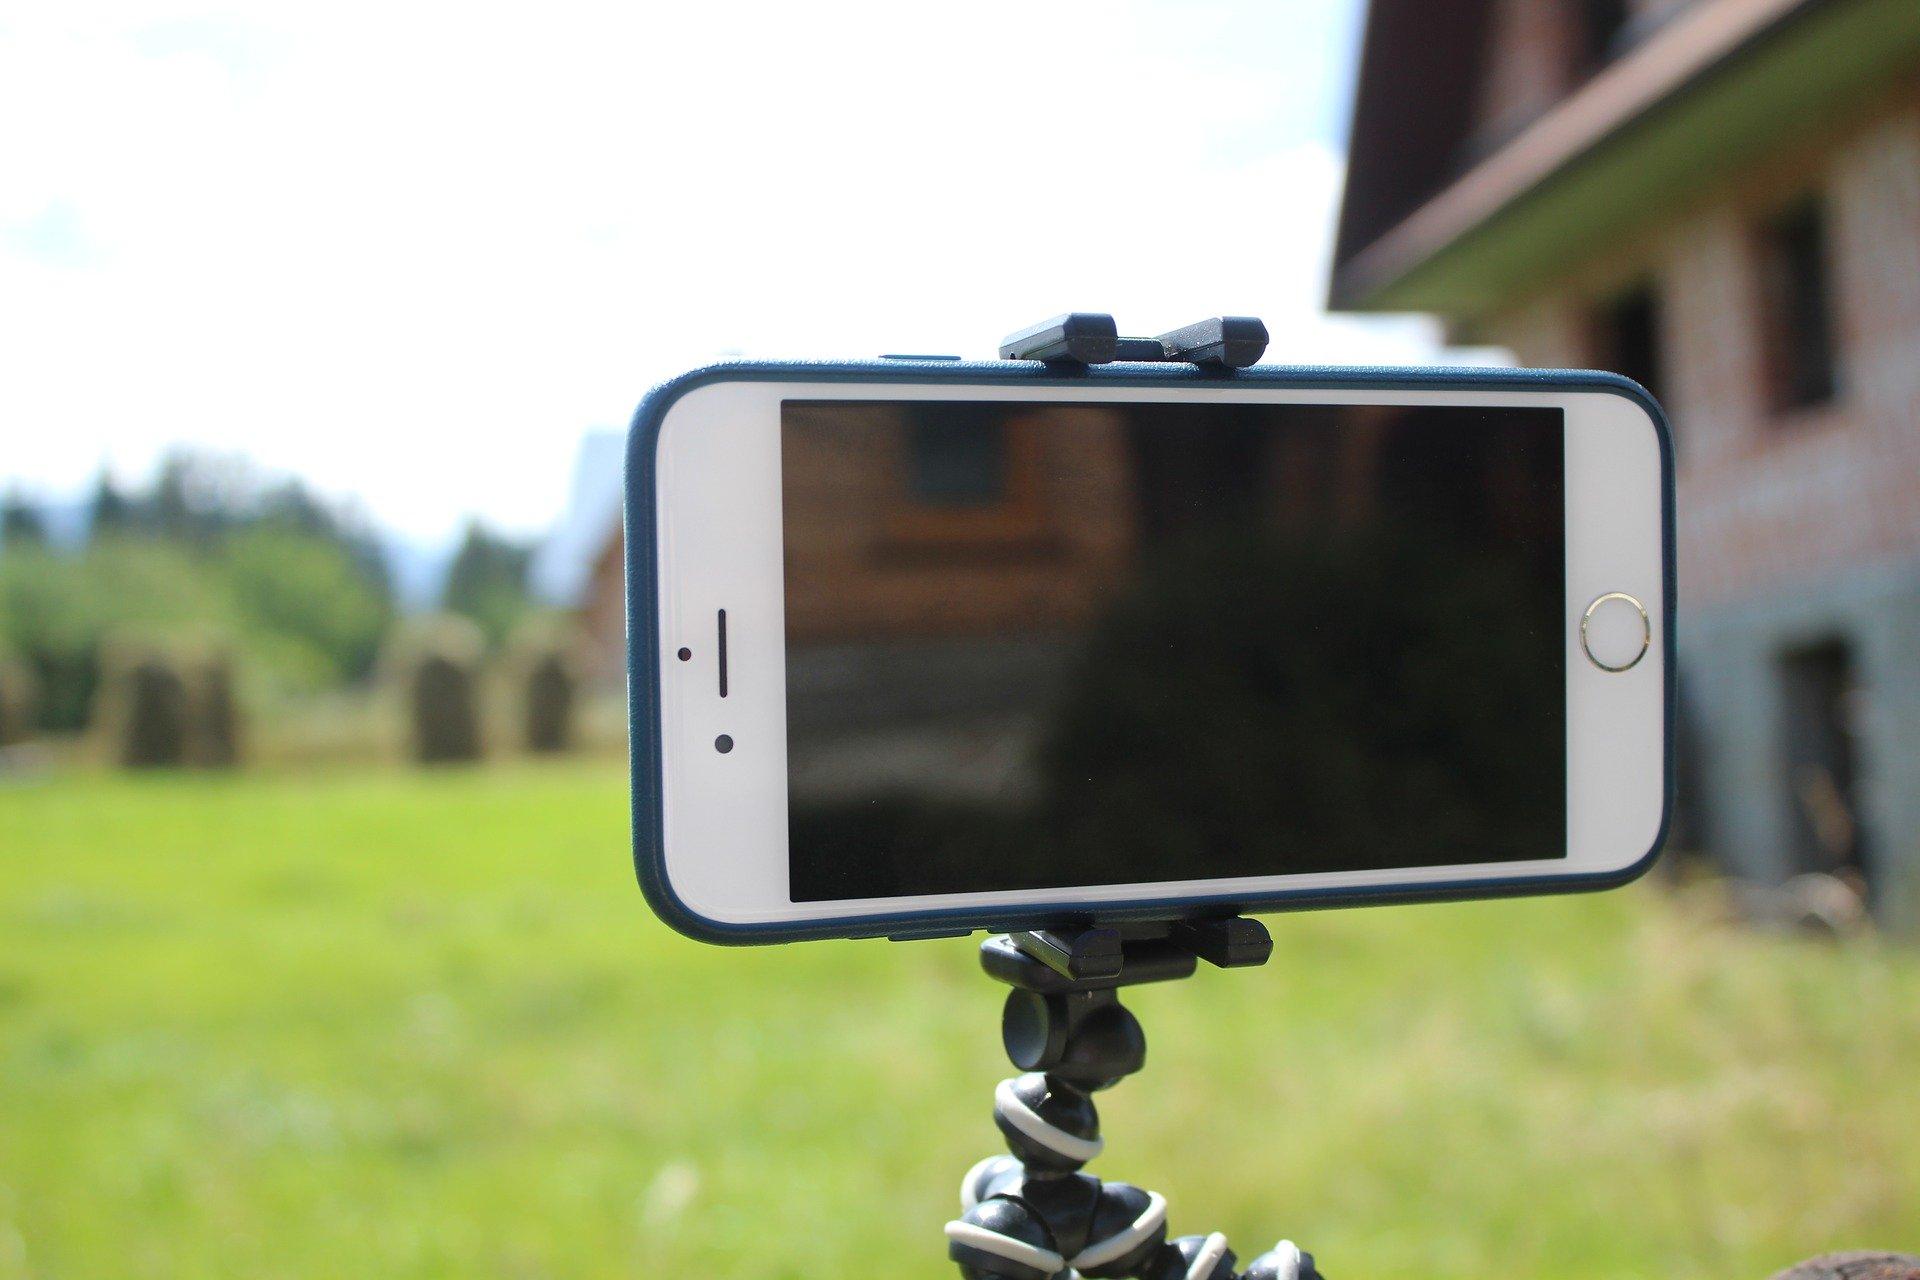 a phone tripod holding a phone